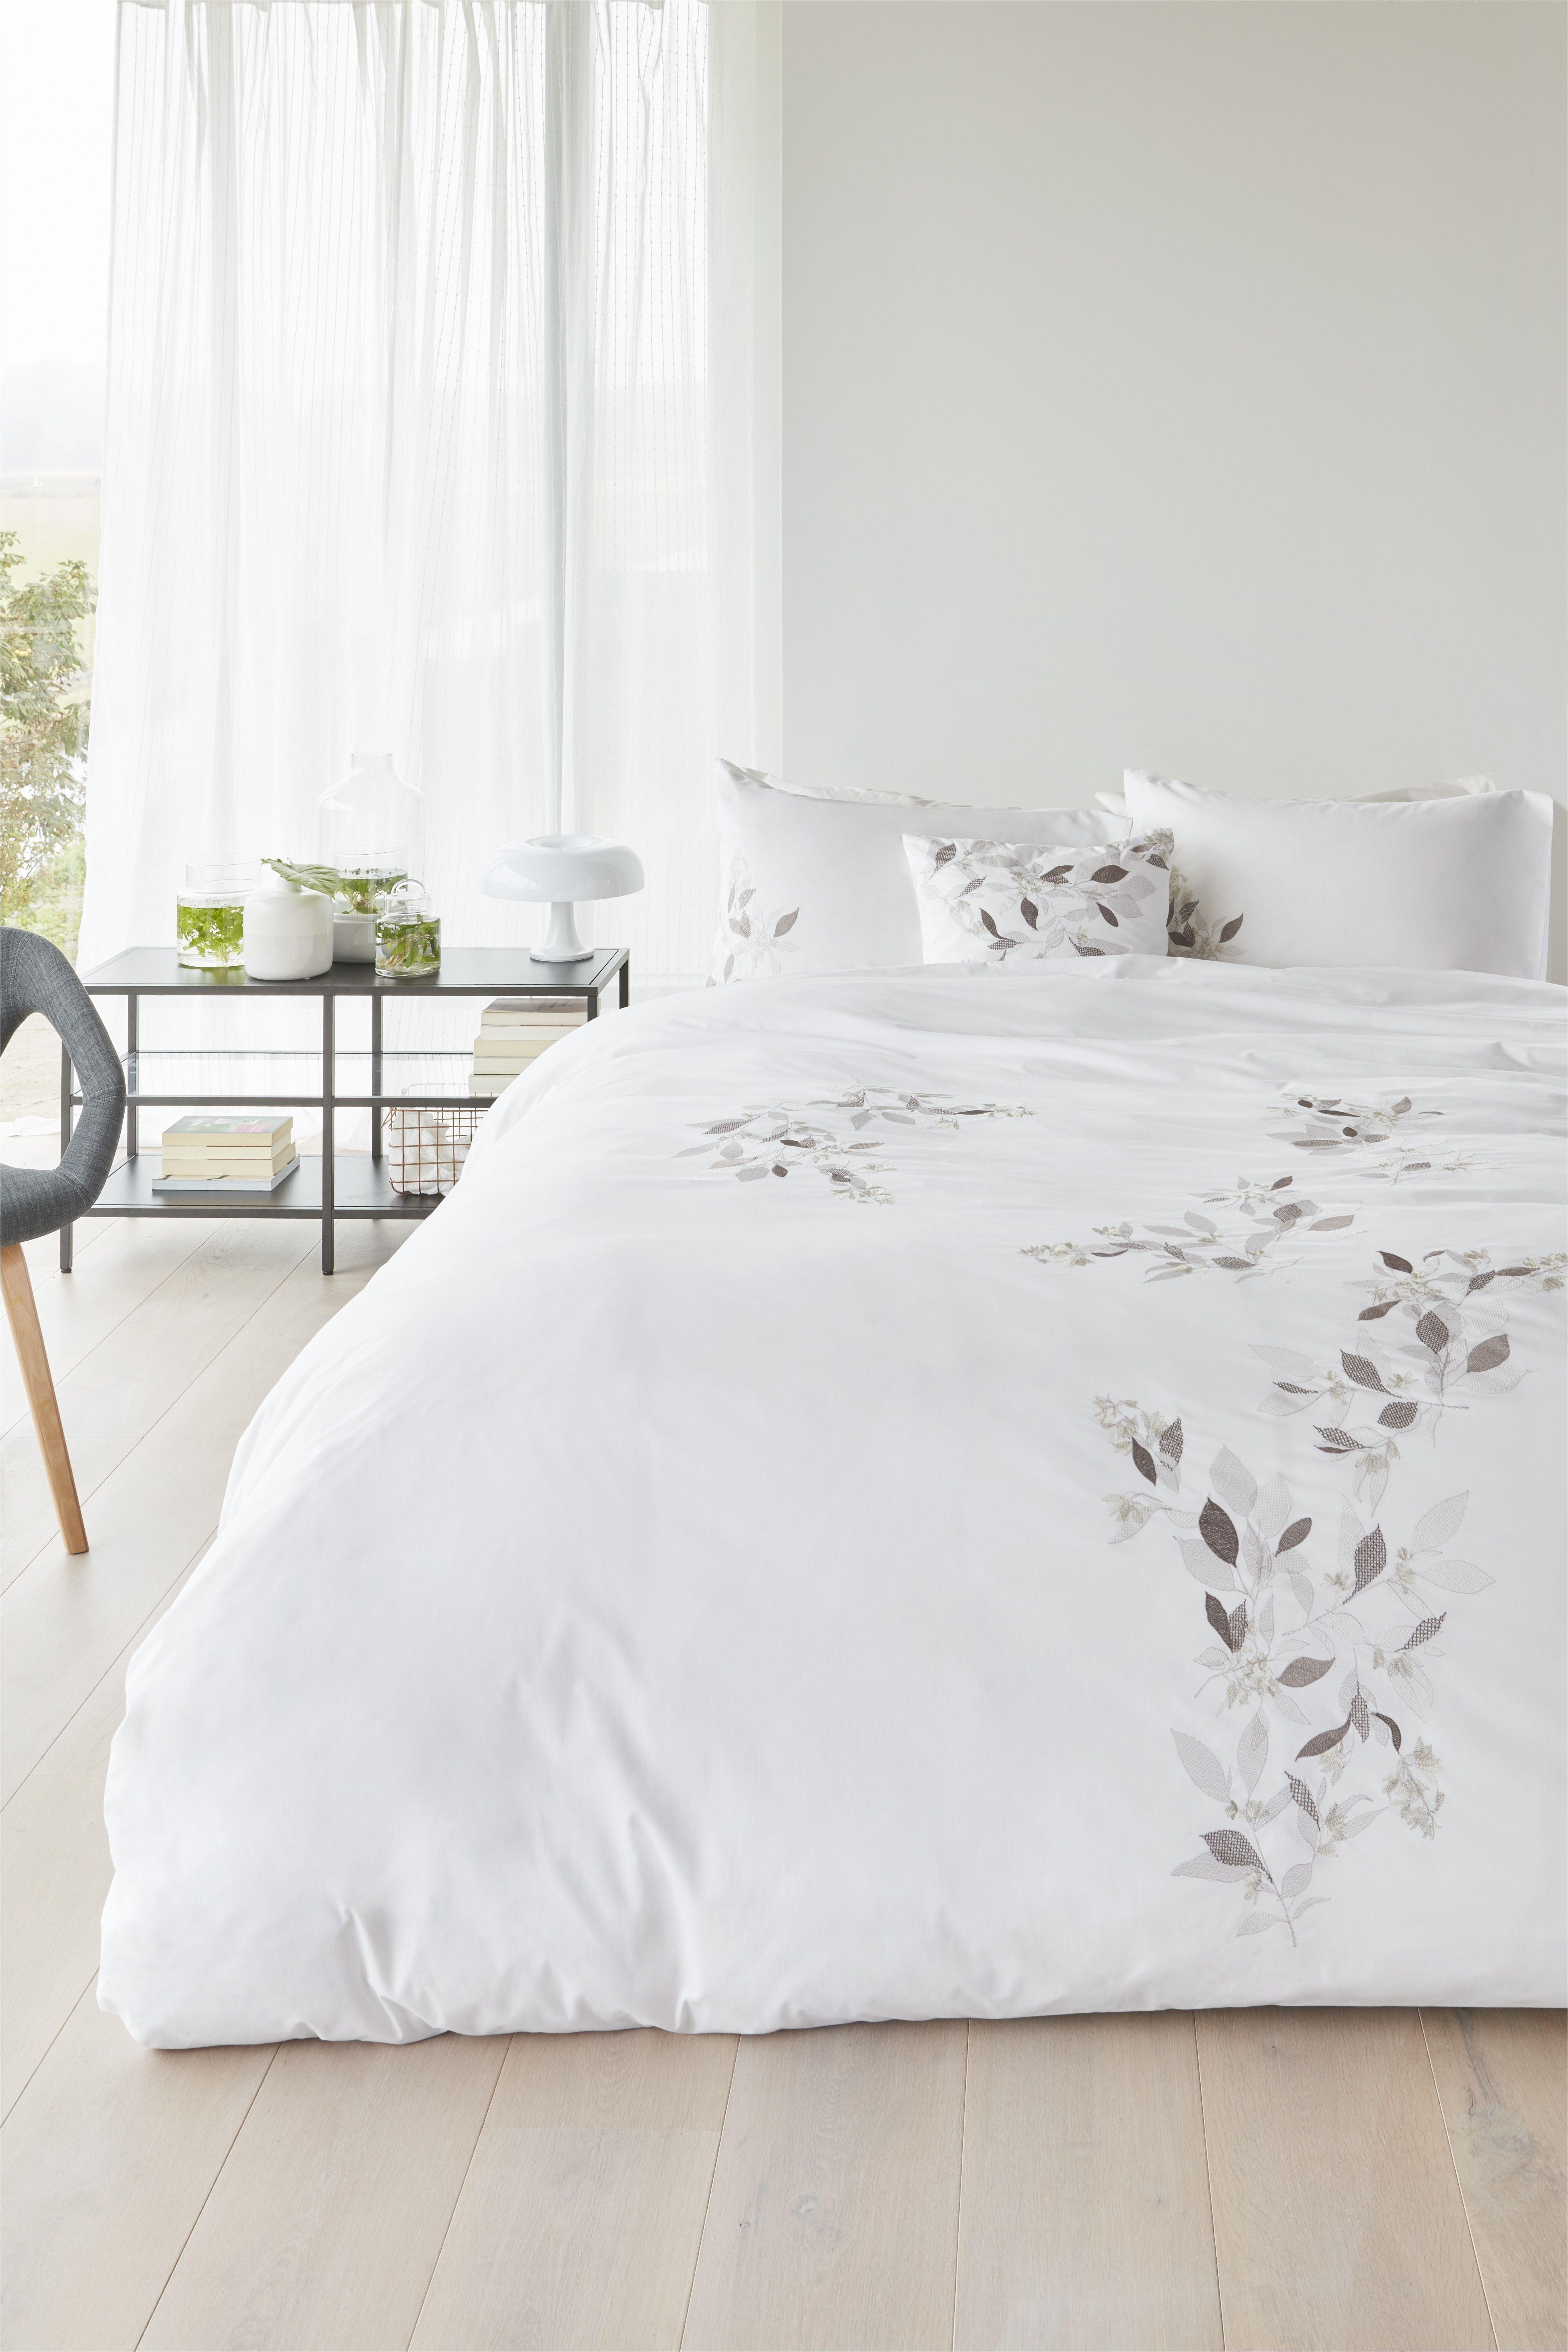 Light Down Comforter Dekbedovertrek Margaret Muir Marlene White Nieuwe Collectie